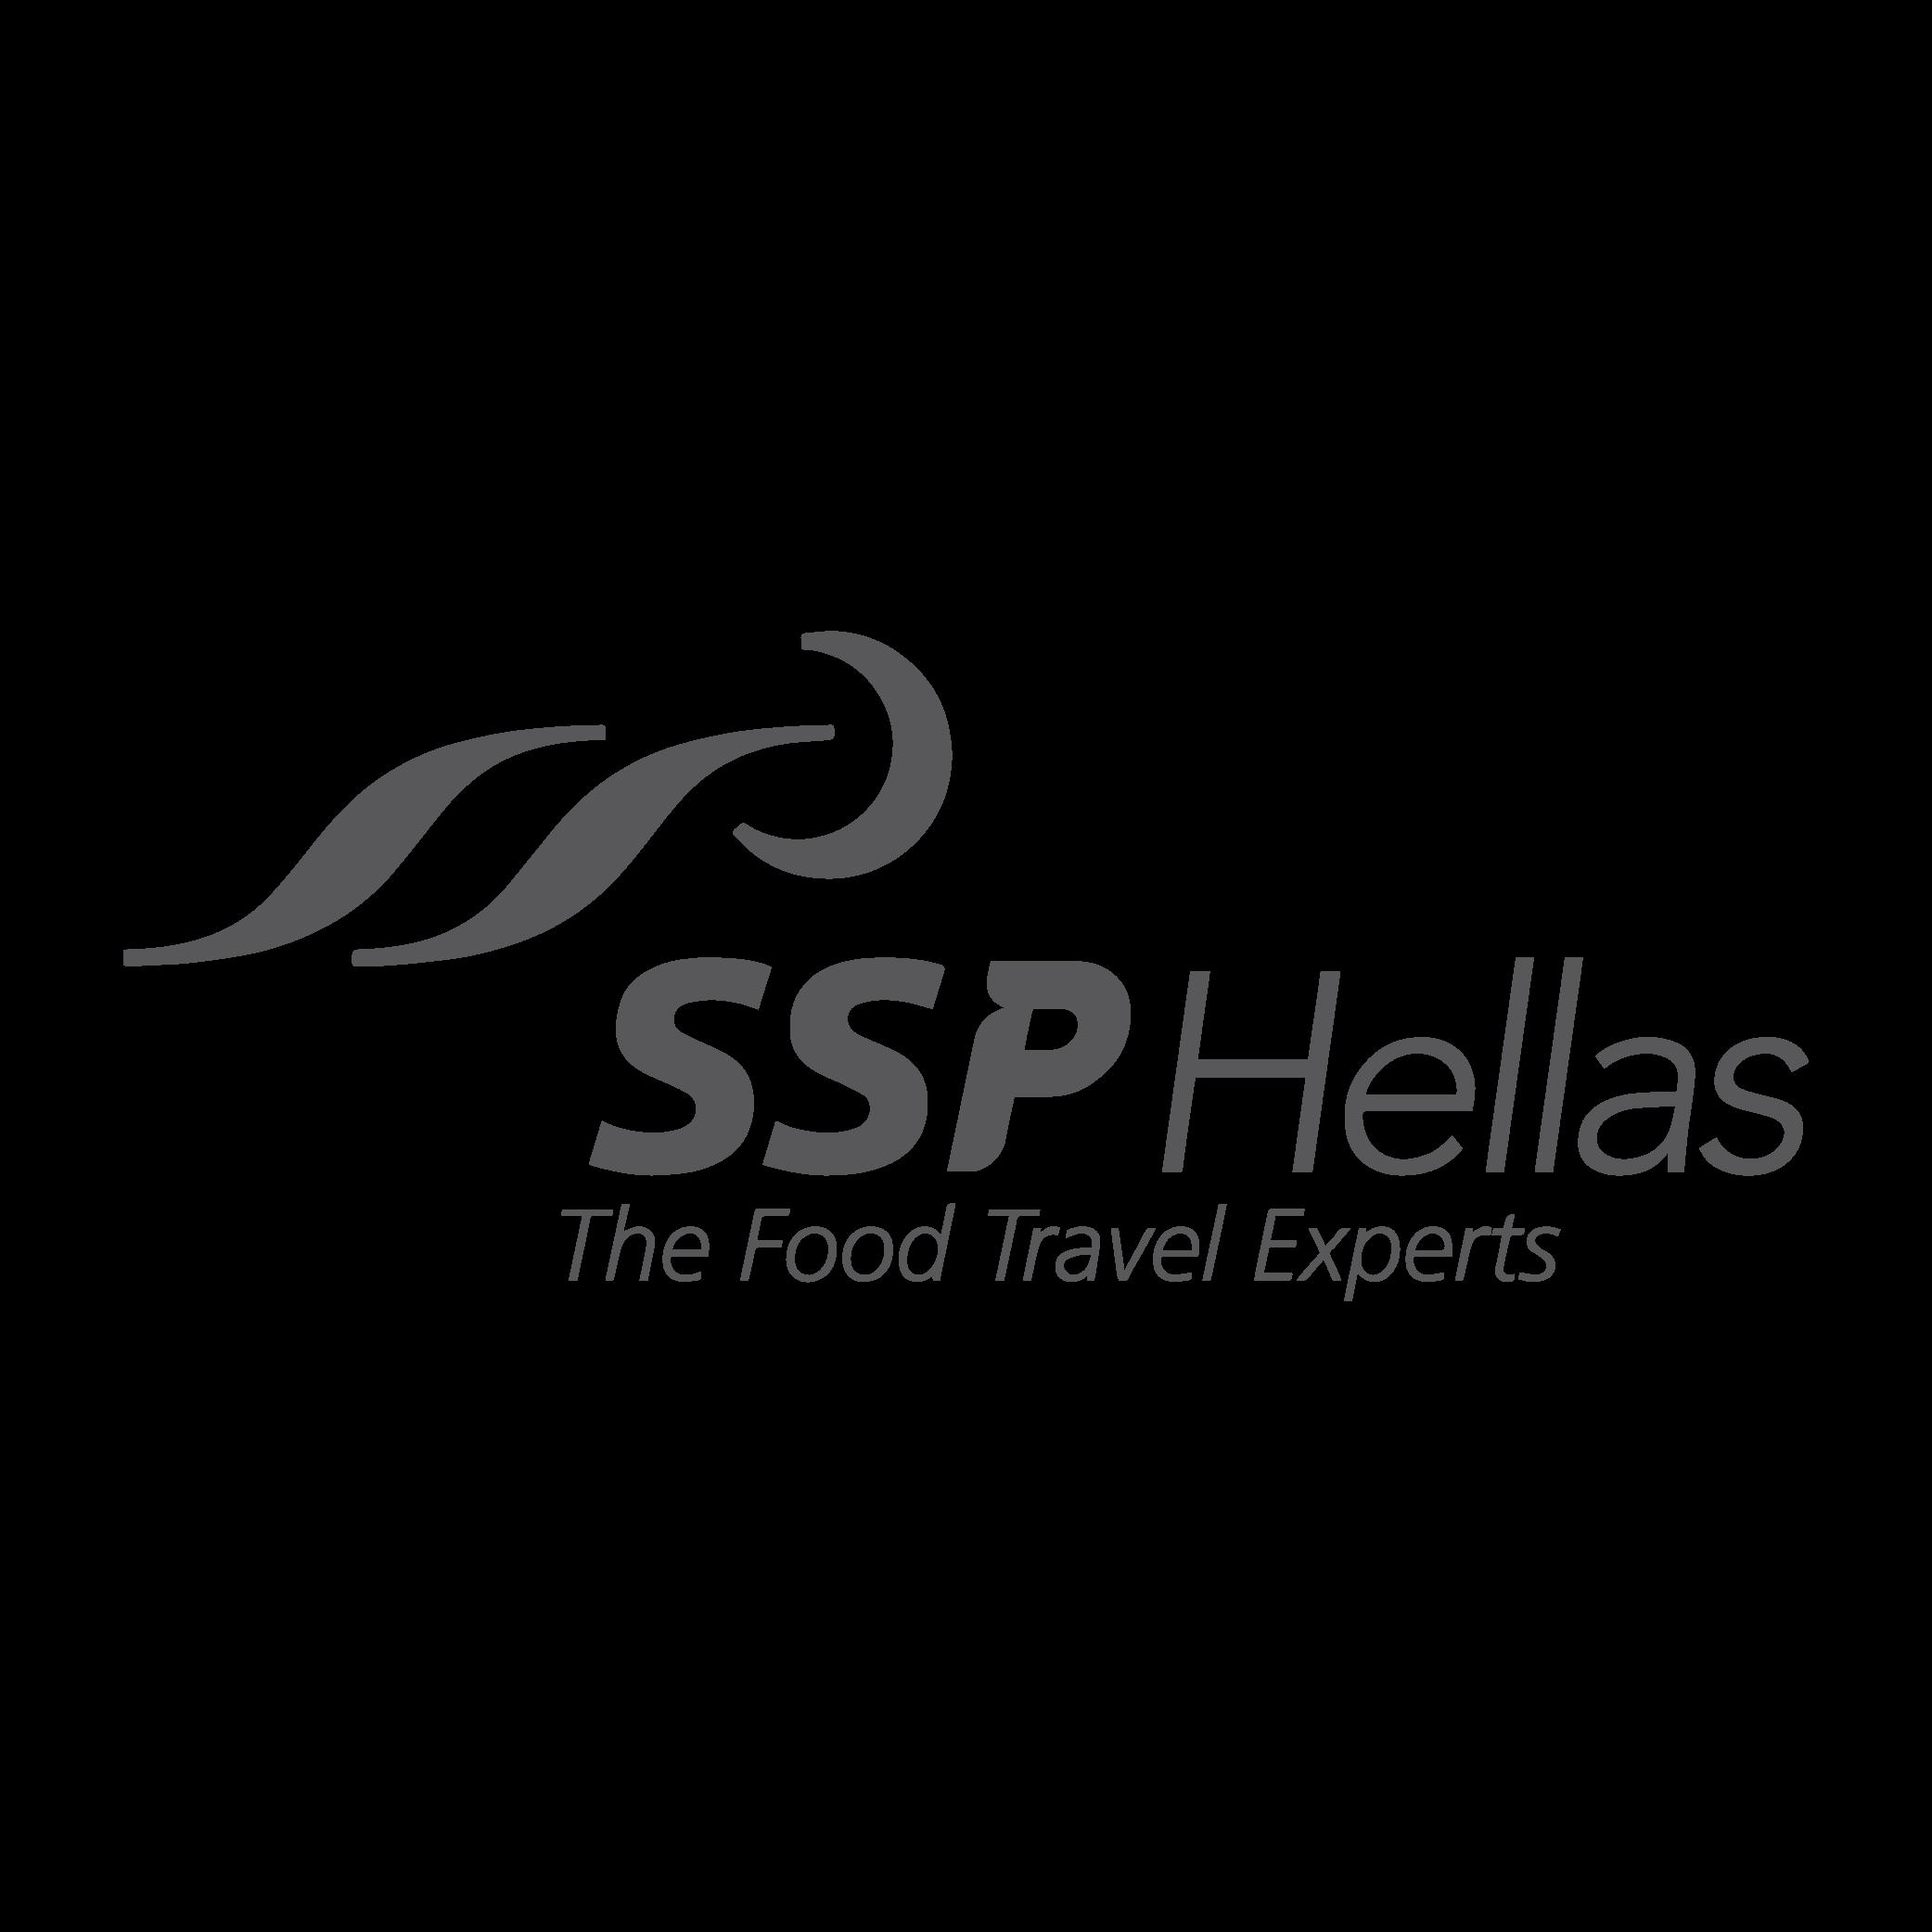 SSP Hellas logo